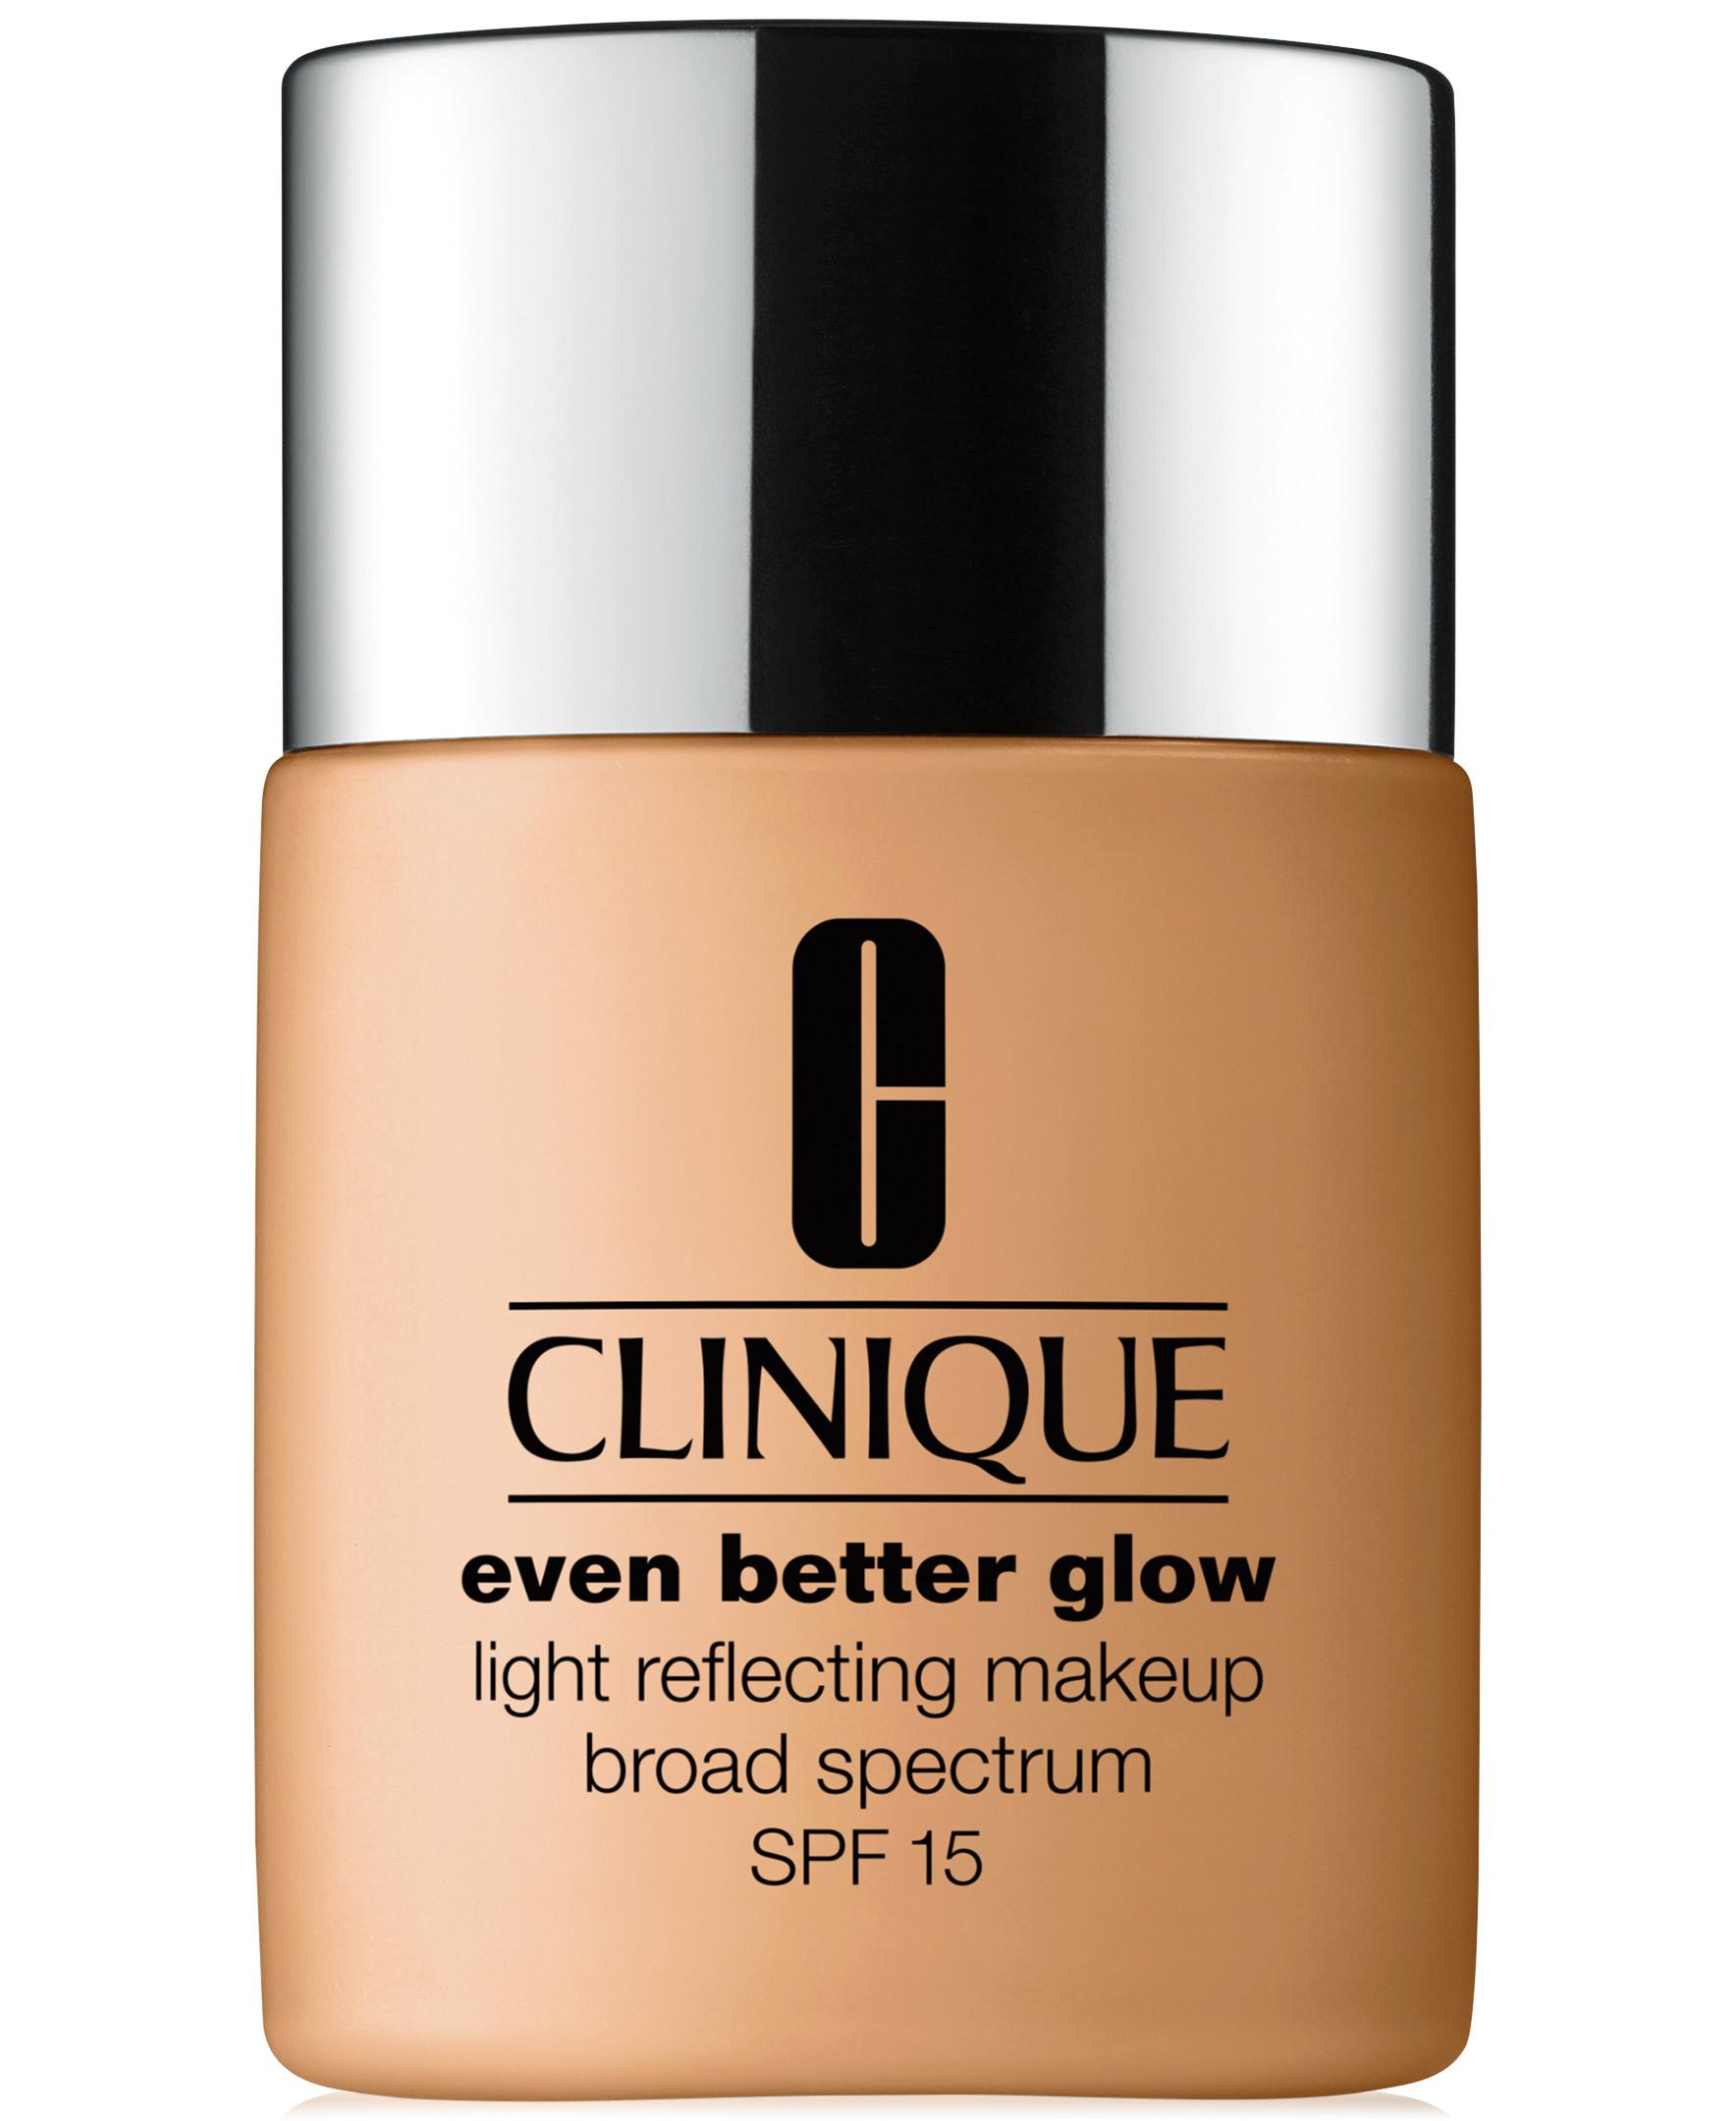 Clinique Even Better Glow Foundation SPF 15, 1-oz. - $29.00.jpg